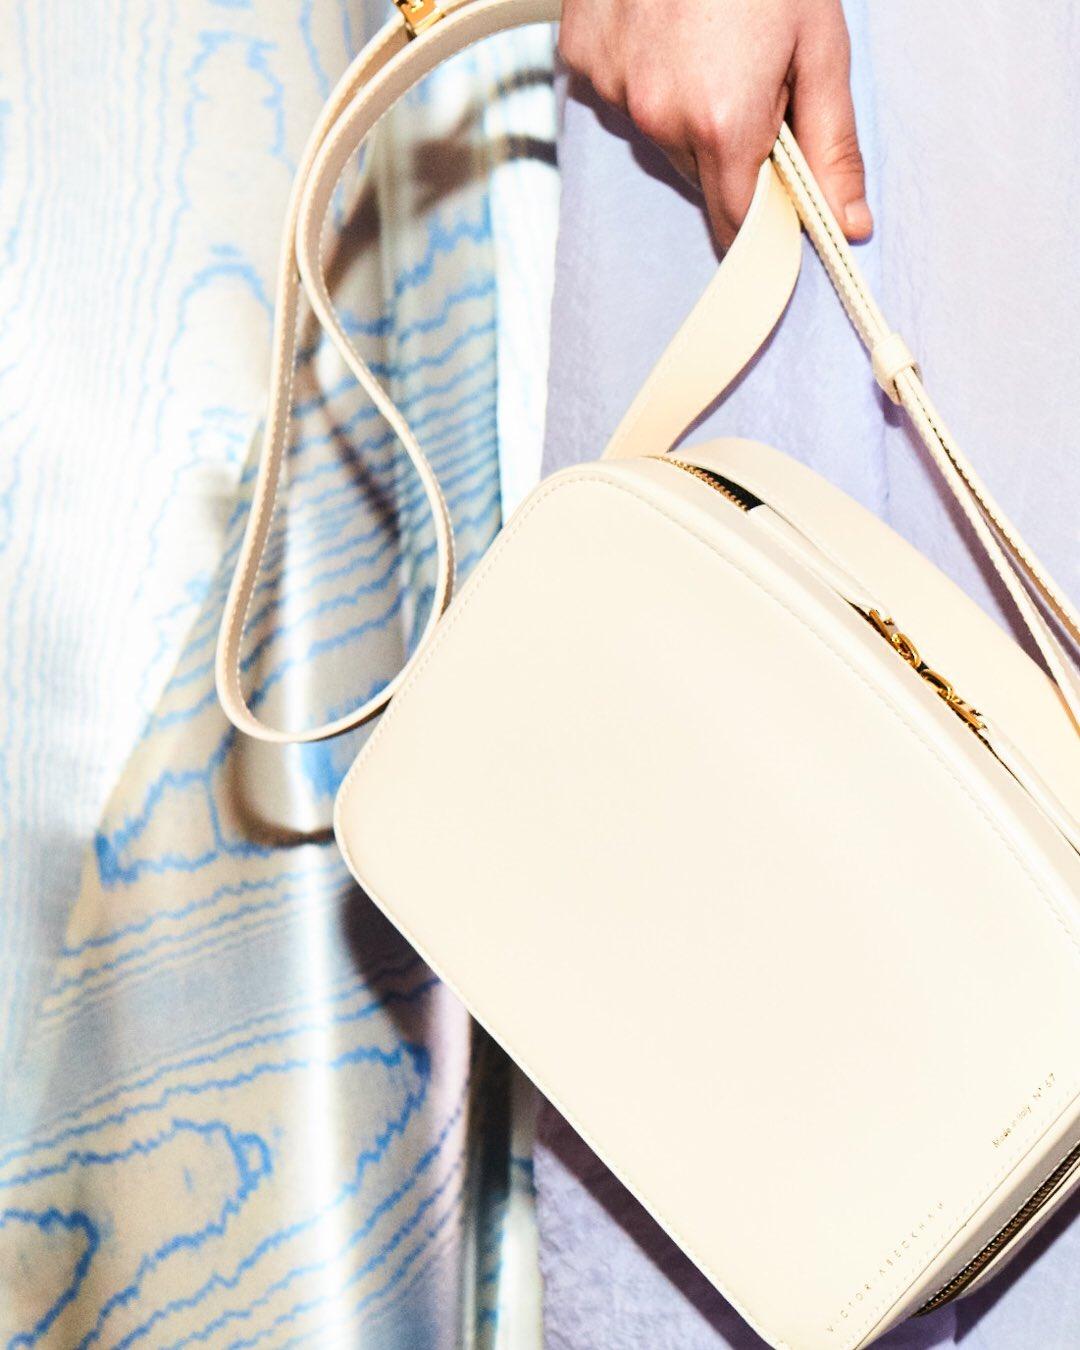 The Vanity Camera Bag #VBSS18 https://t.co/c2jQH8B5Al